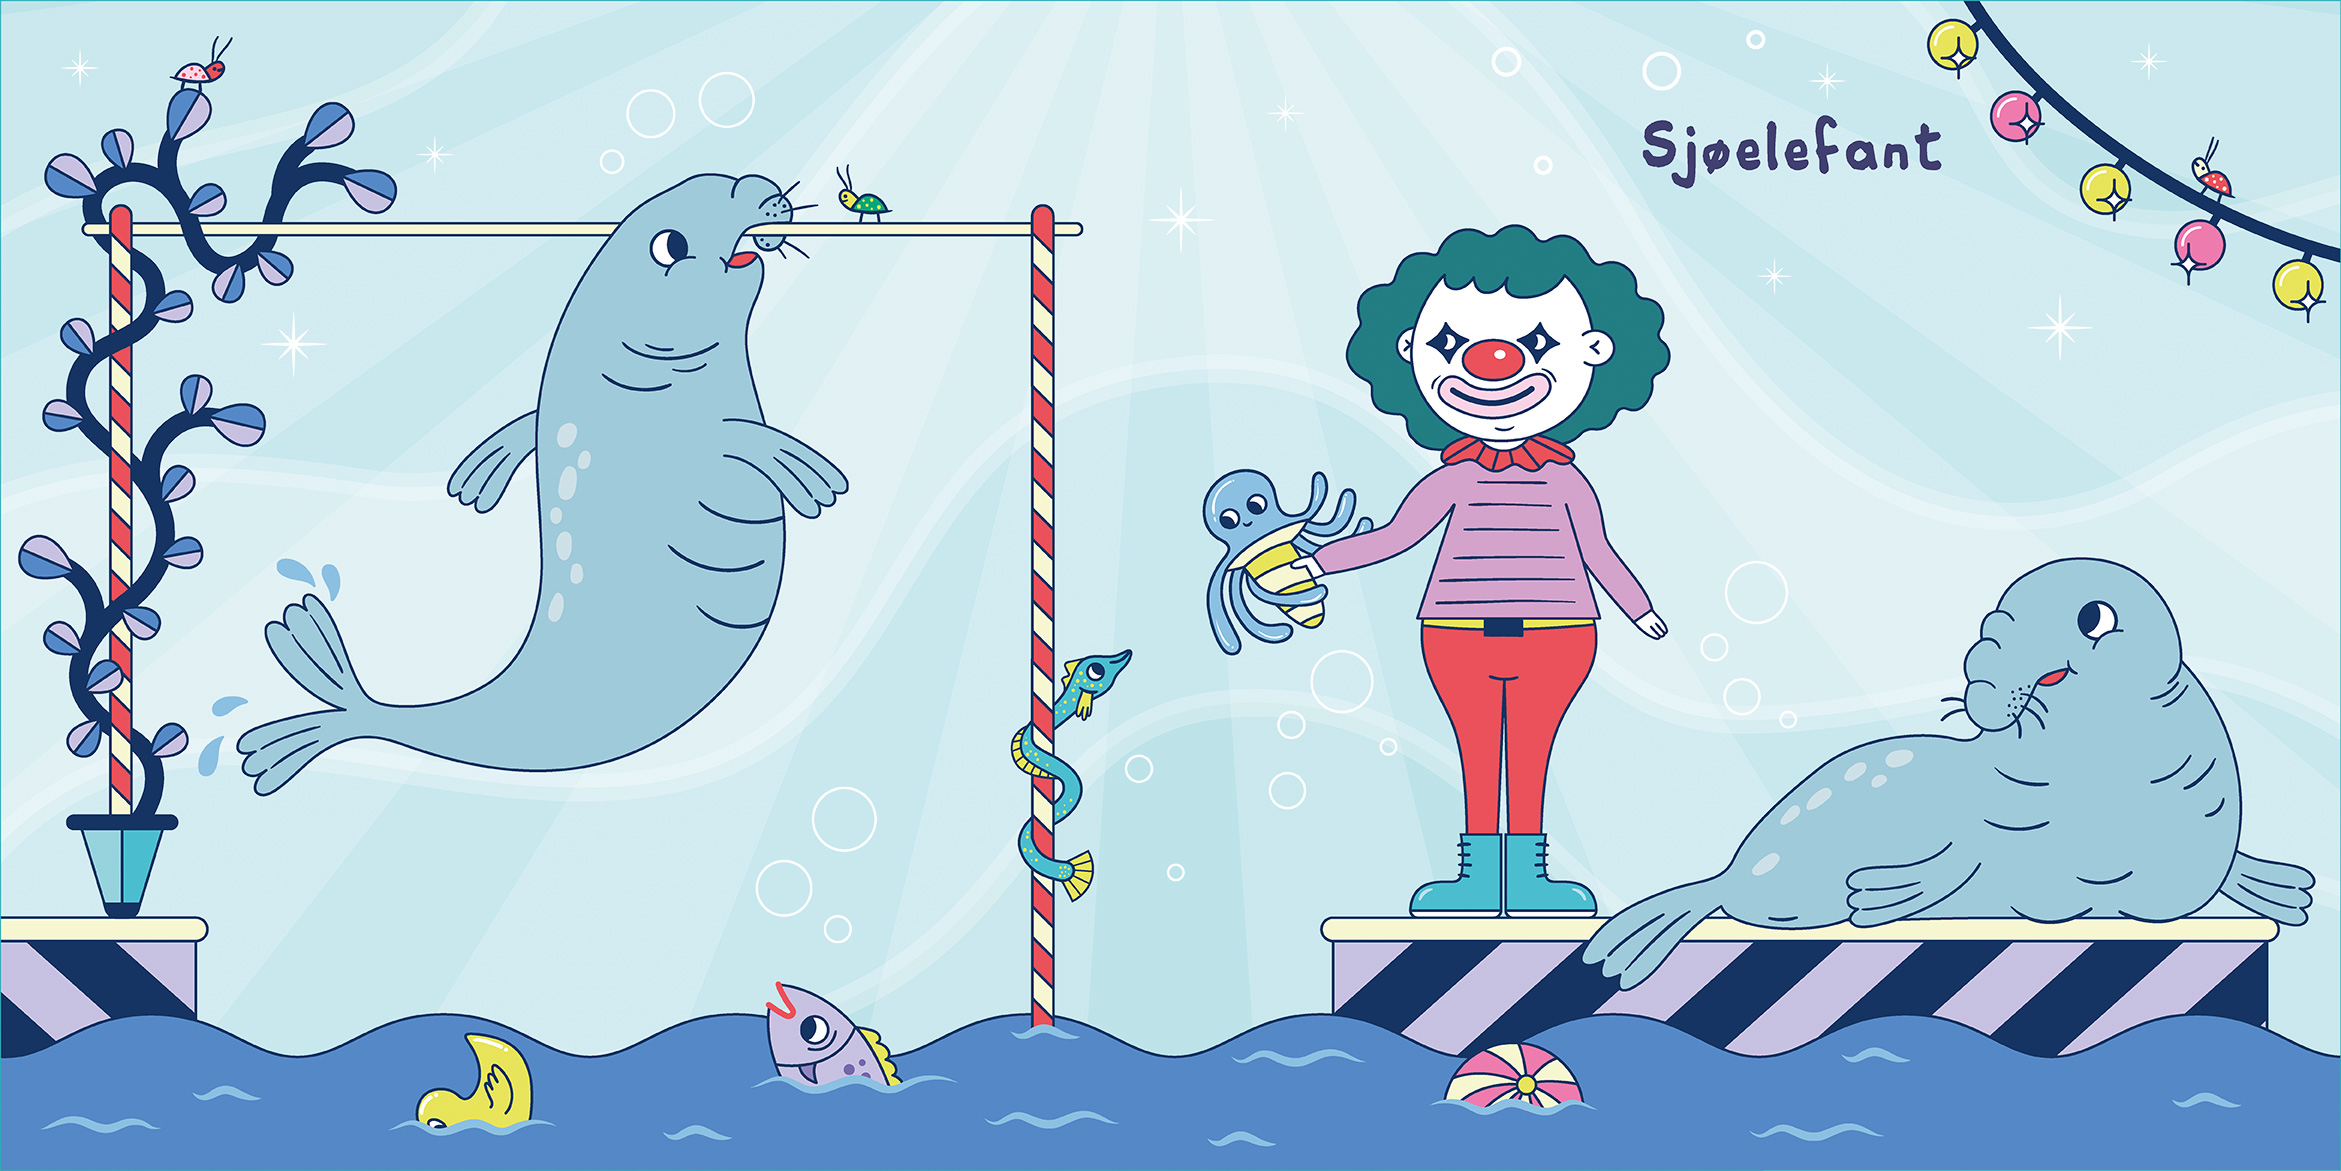 Sea_elephant.jpg